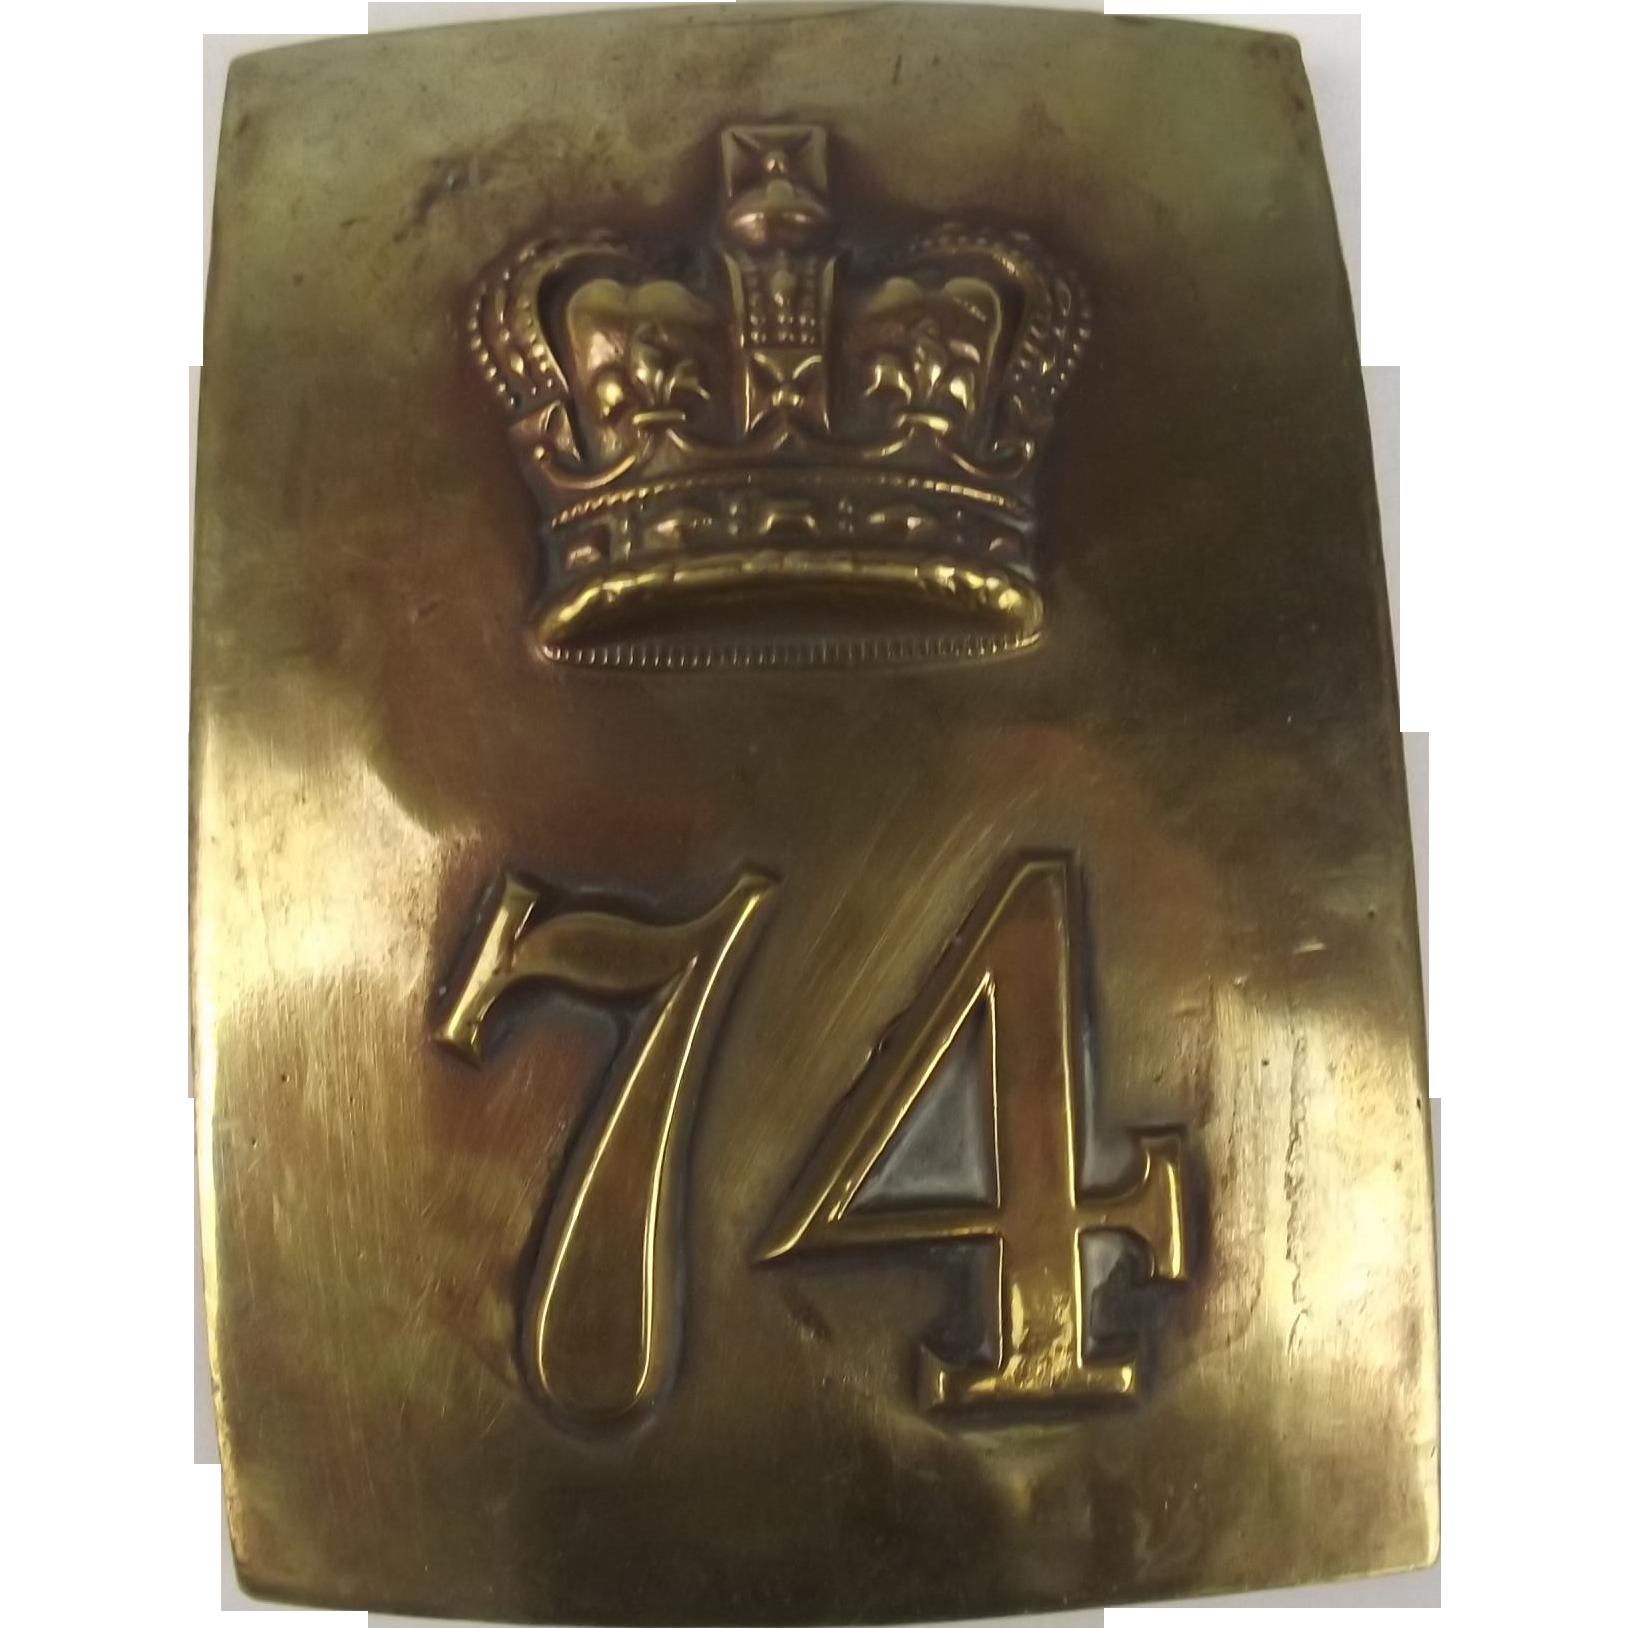 74th Regiment of Foot (disambiguation)